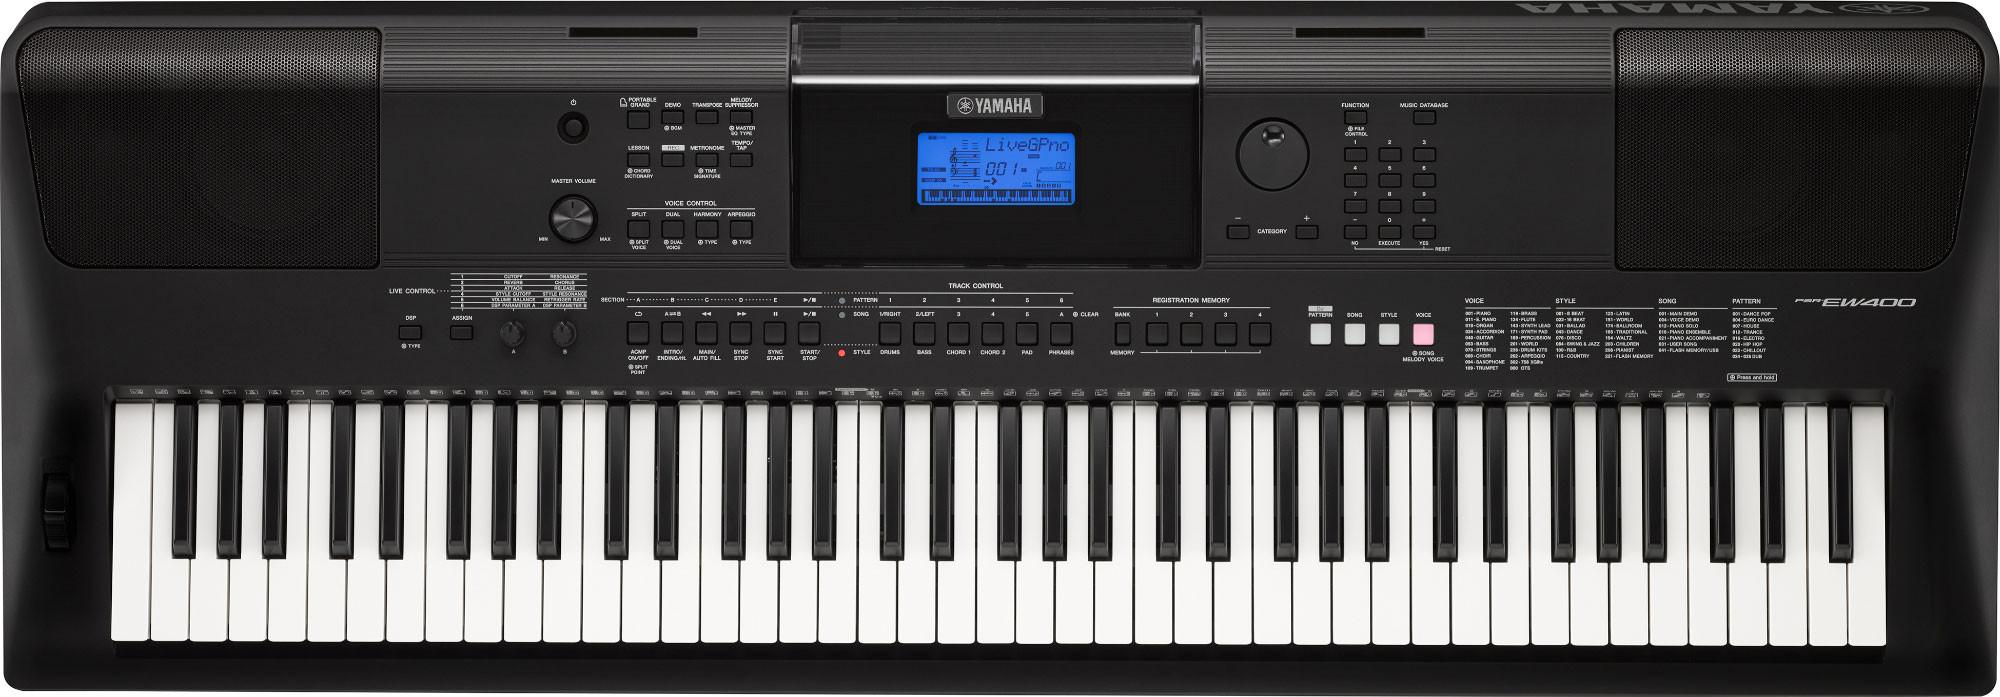 Yamaha psr ew400 teclado port til teclados teclado for Yamaha ew 400